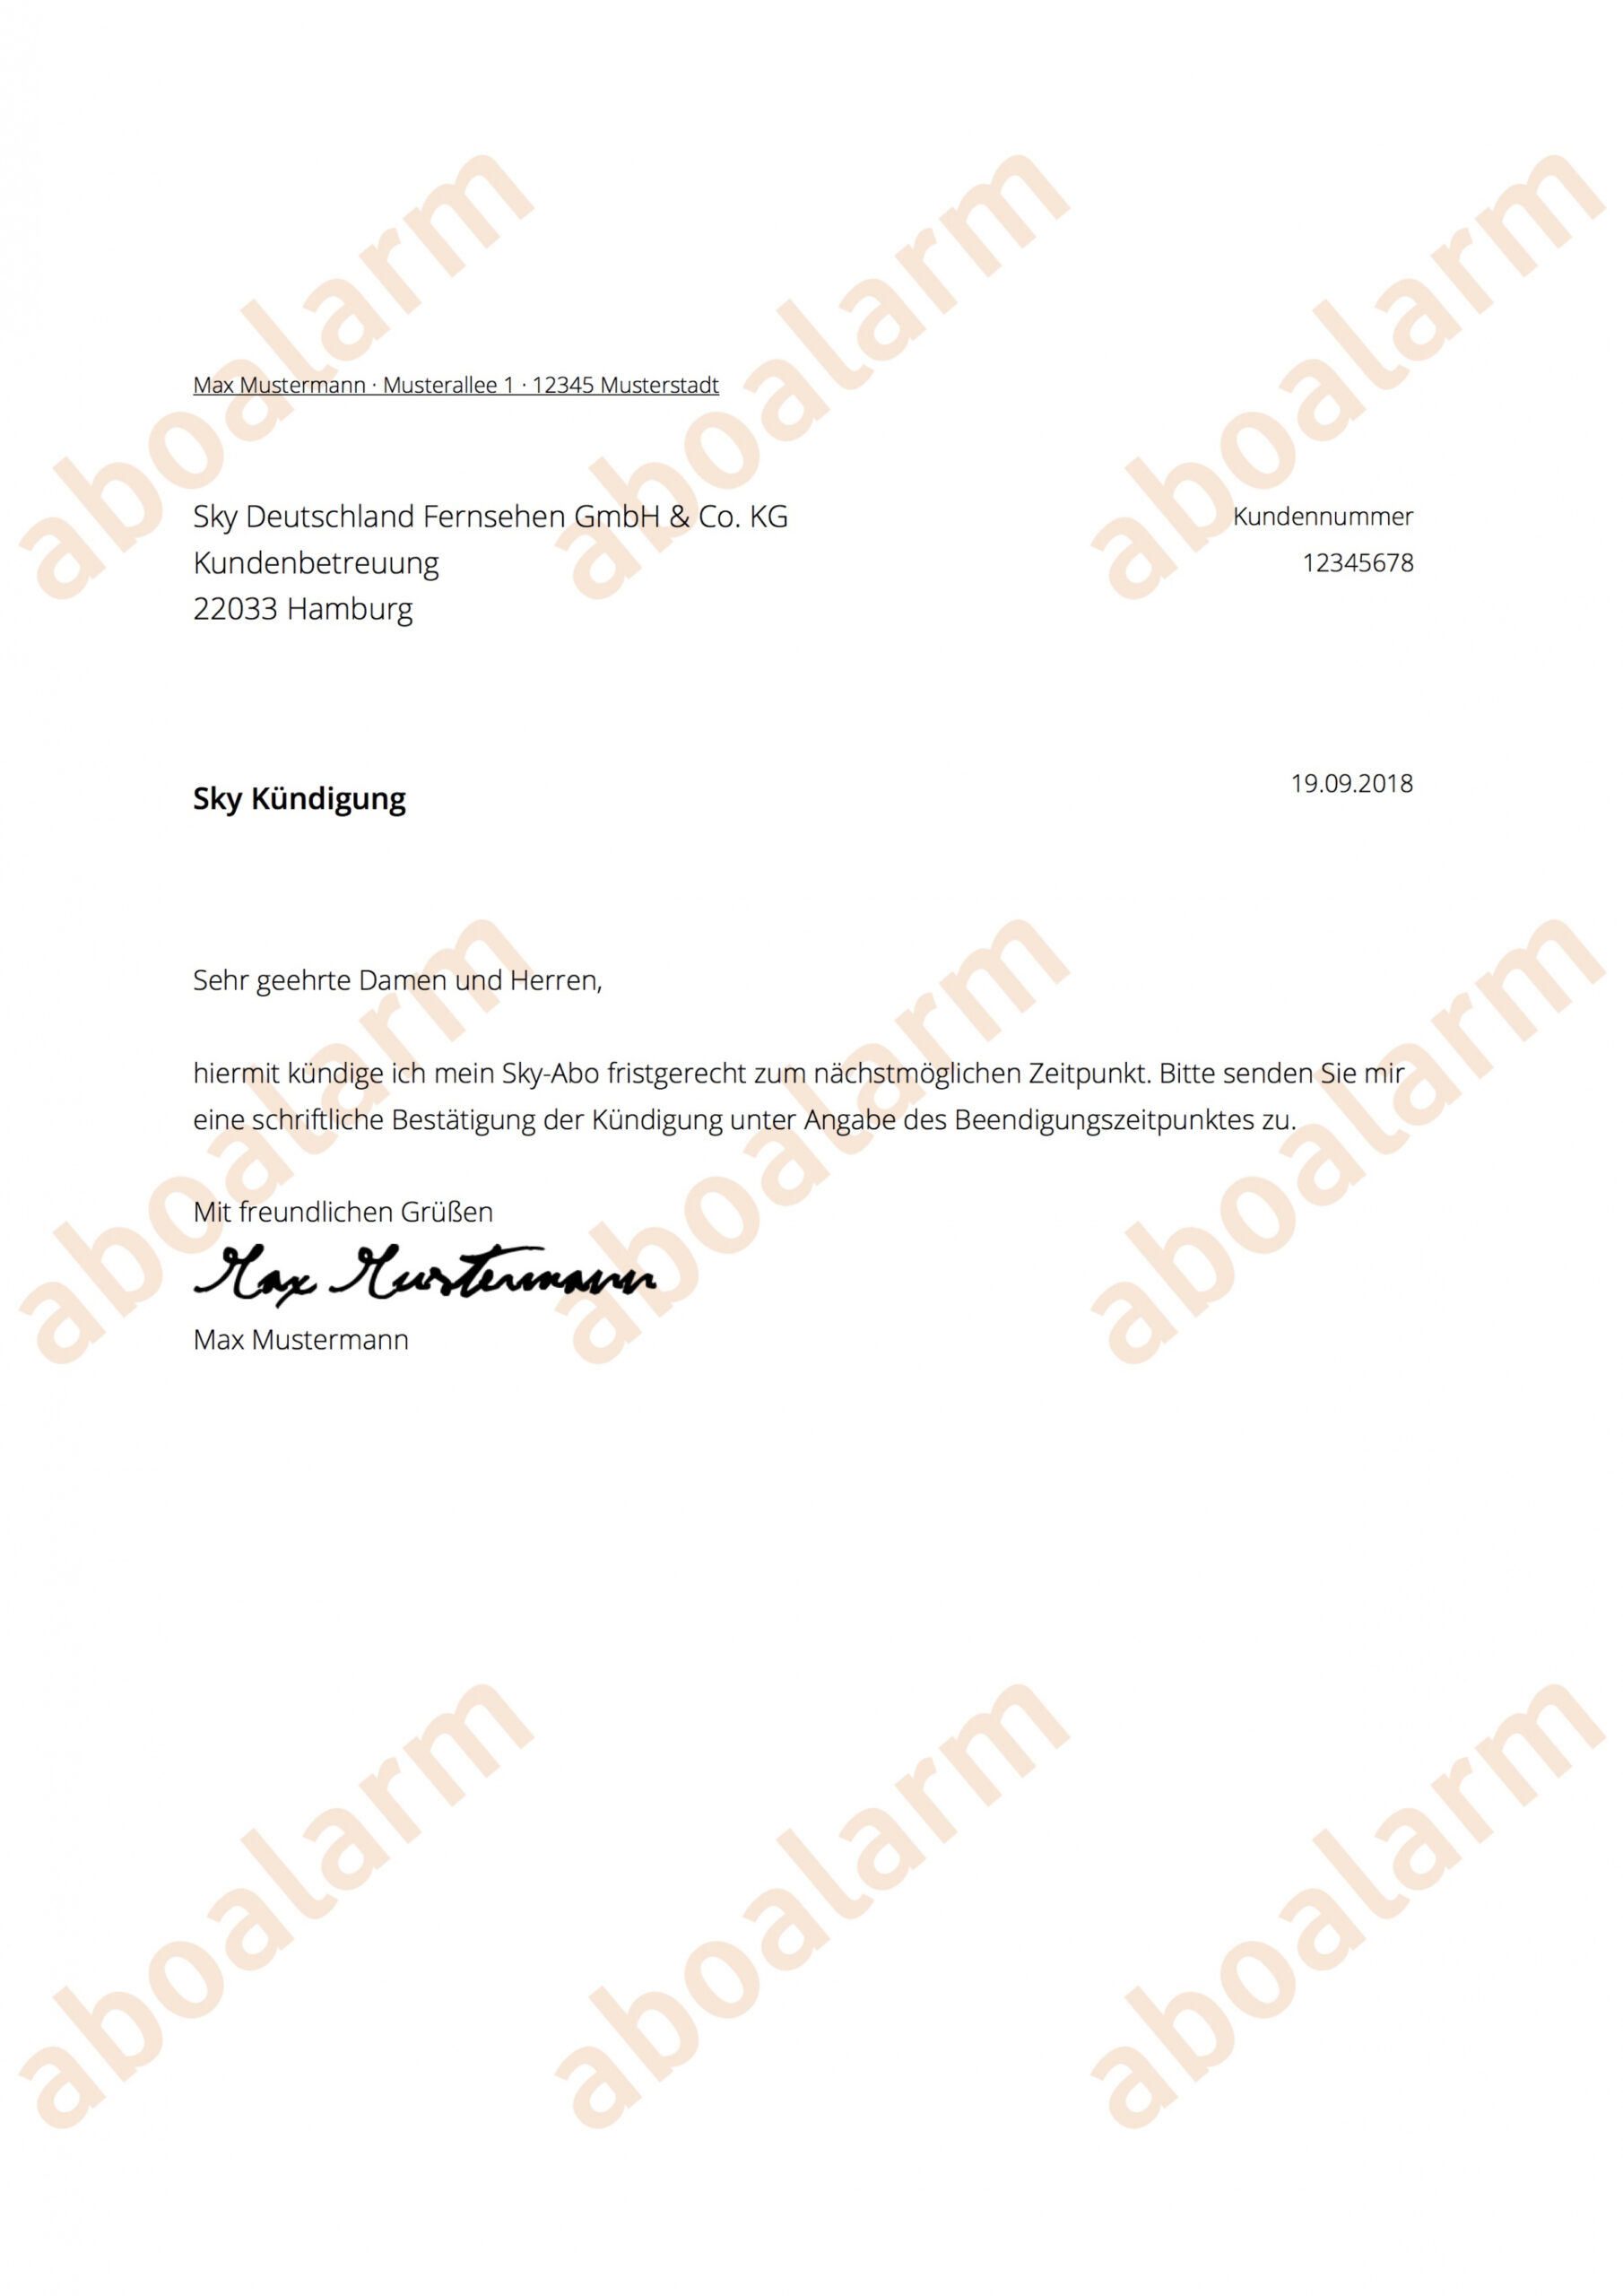 Sampler Kündigung Vertrag Fitnessstudio Vorlage Excel Bearbeitbar